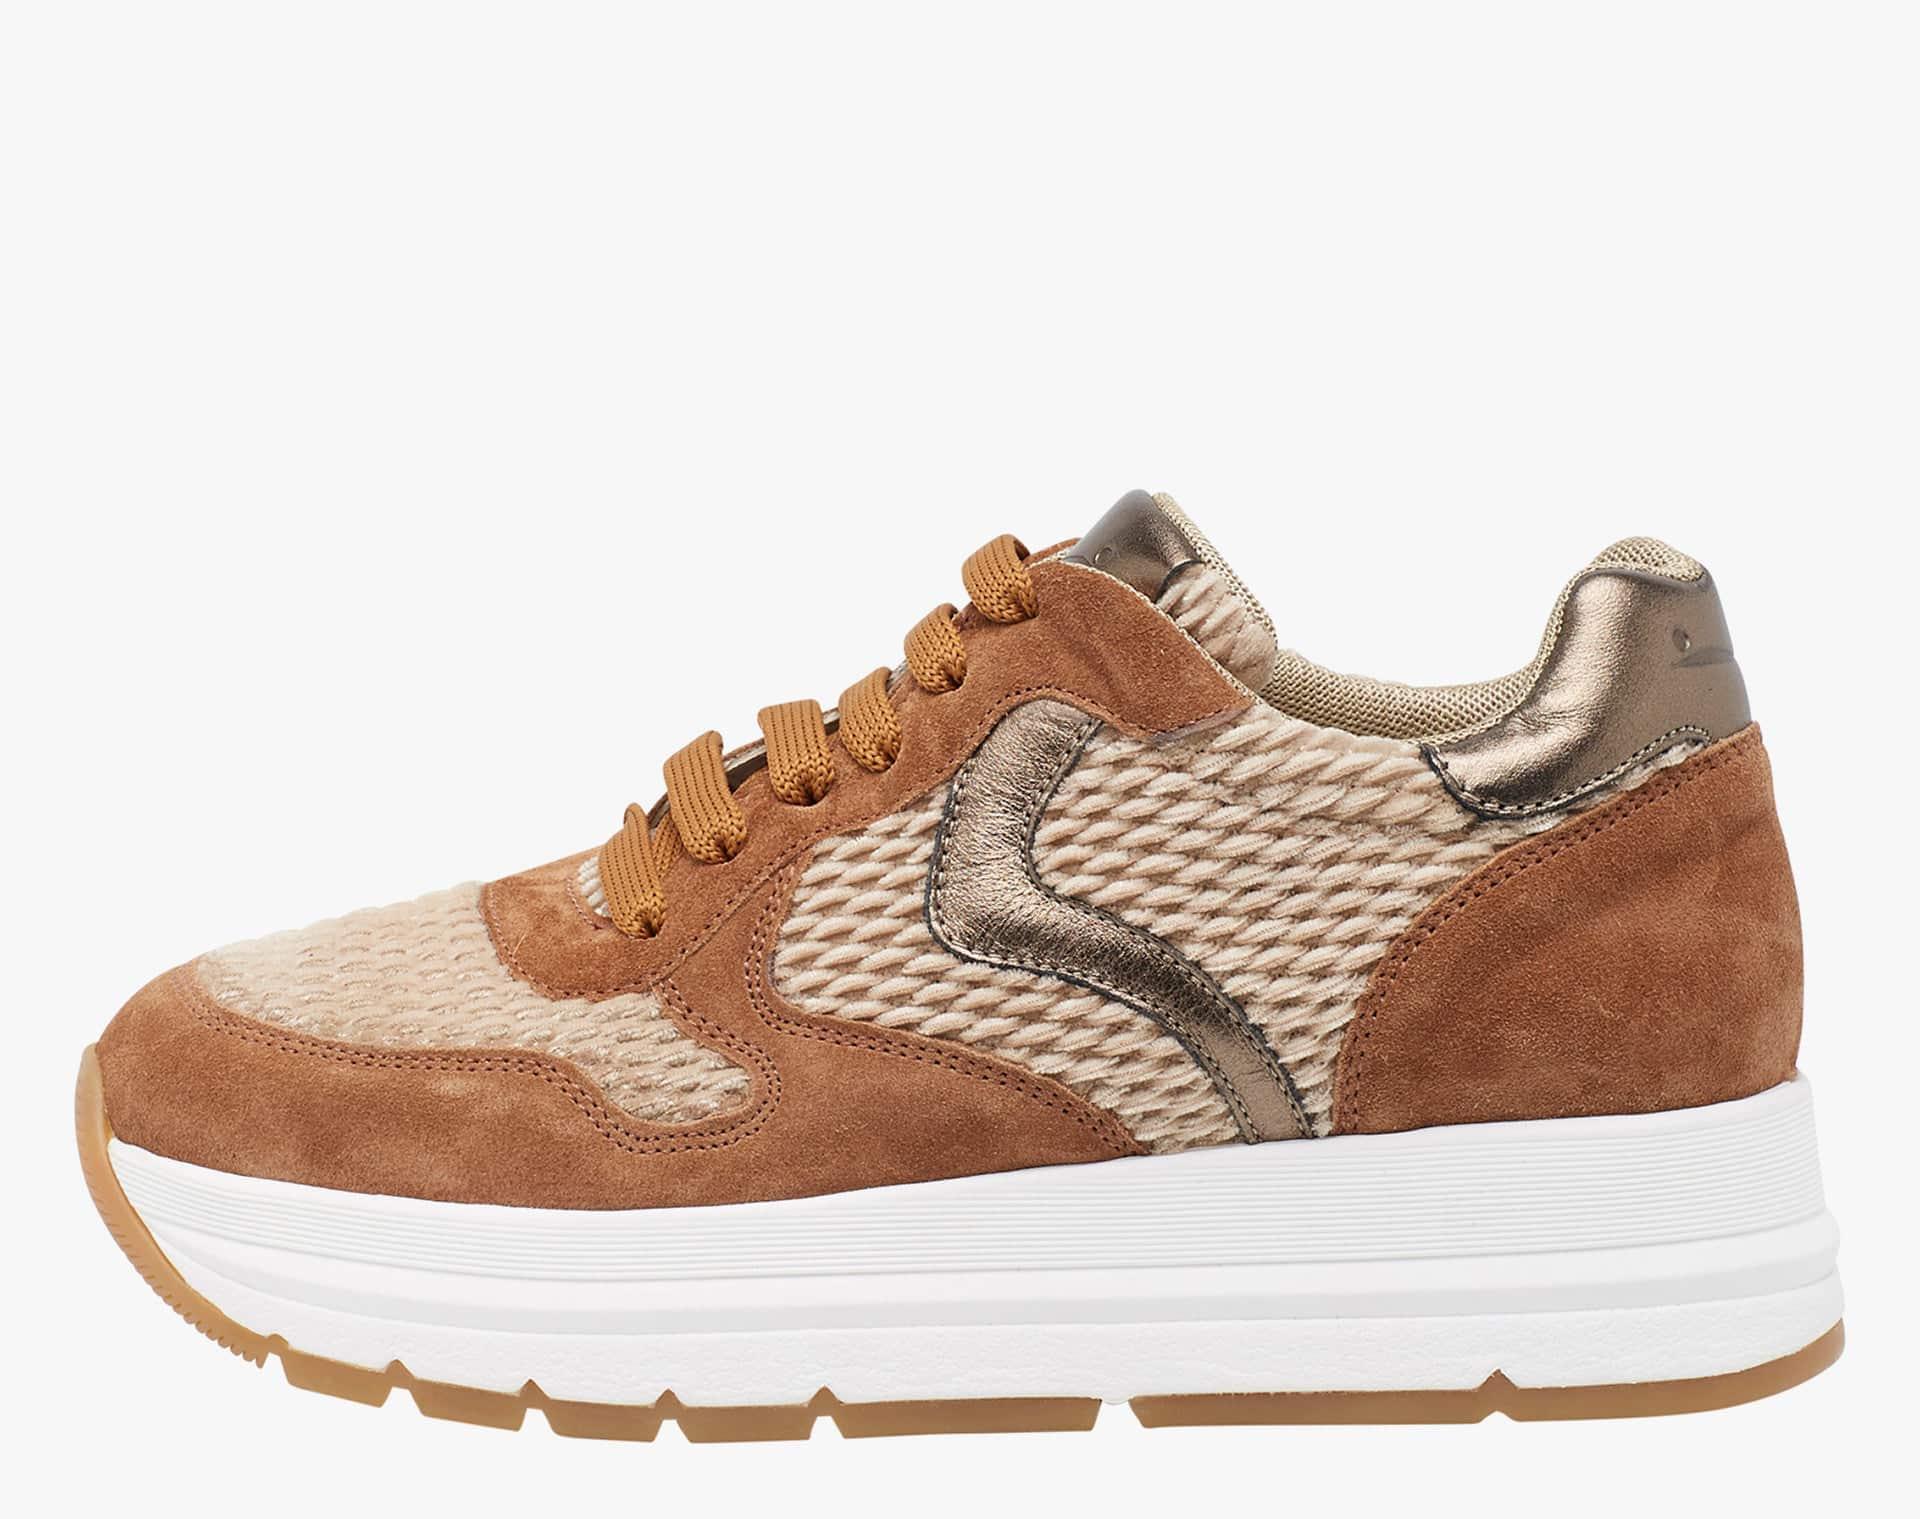 MARAN - Sneaker in pelle e velluto - Tortora